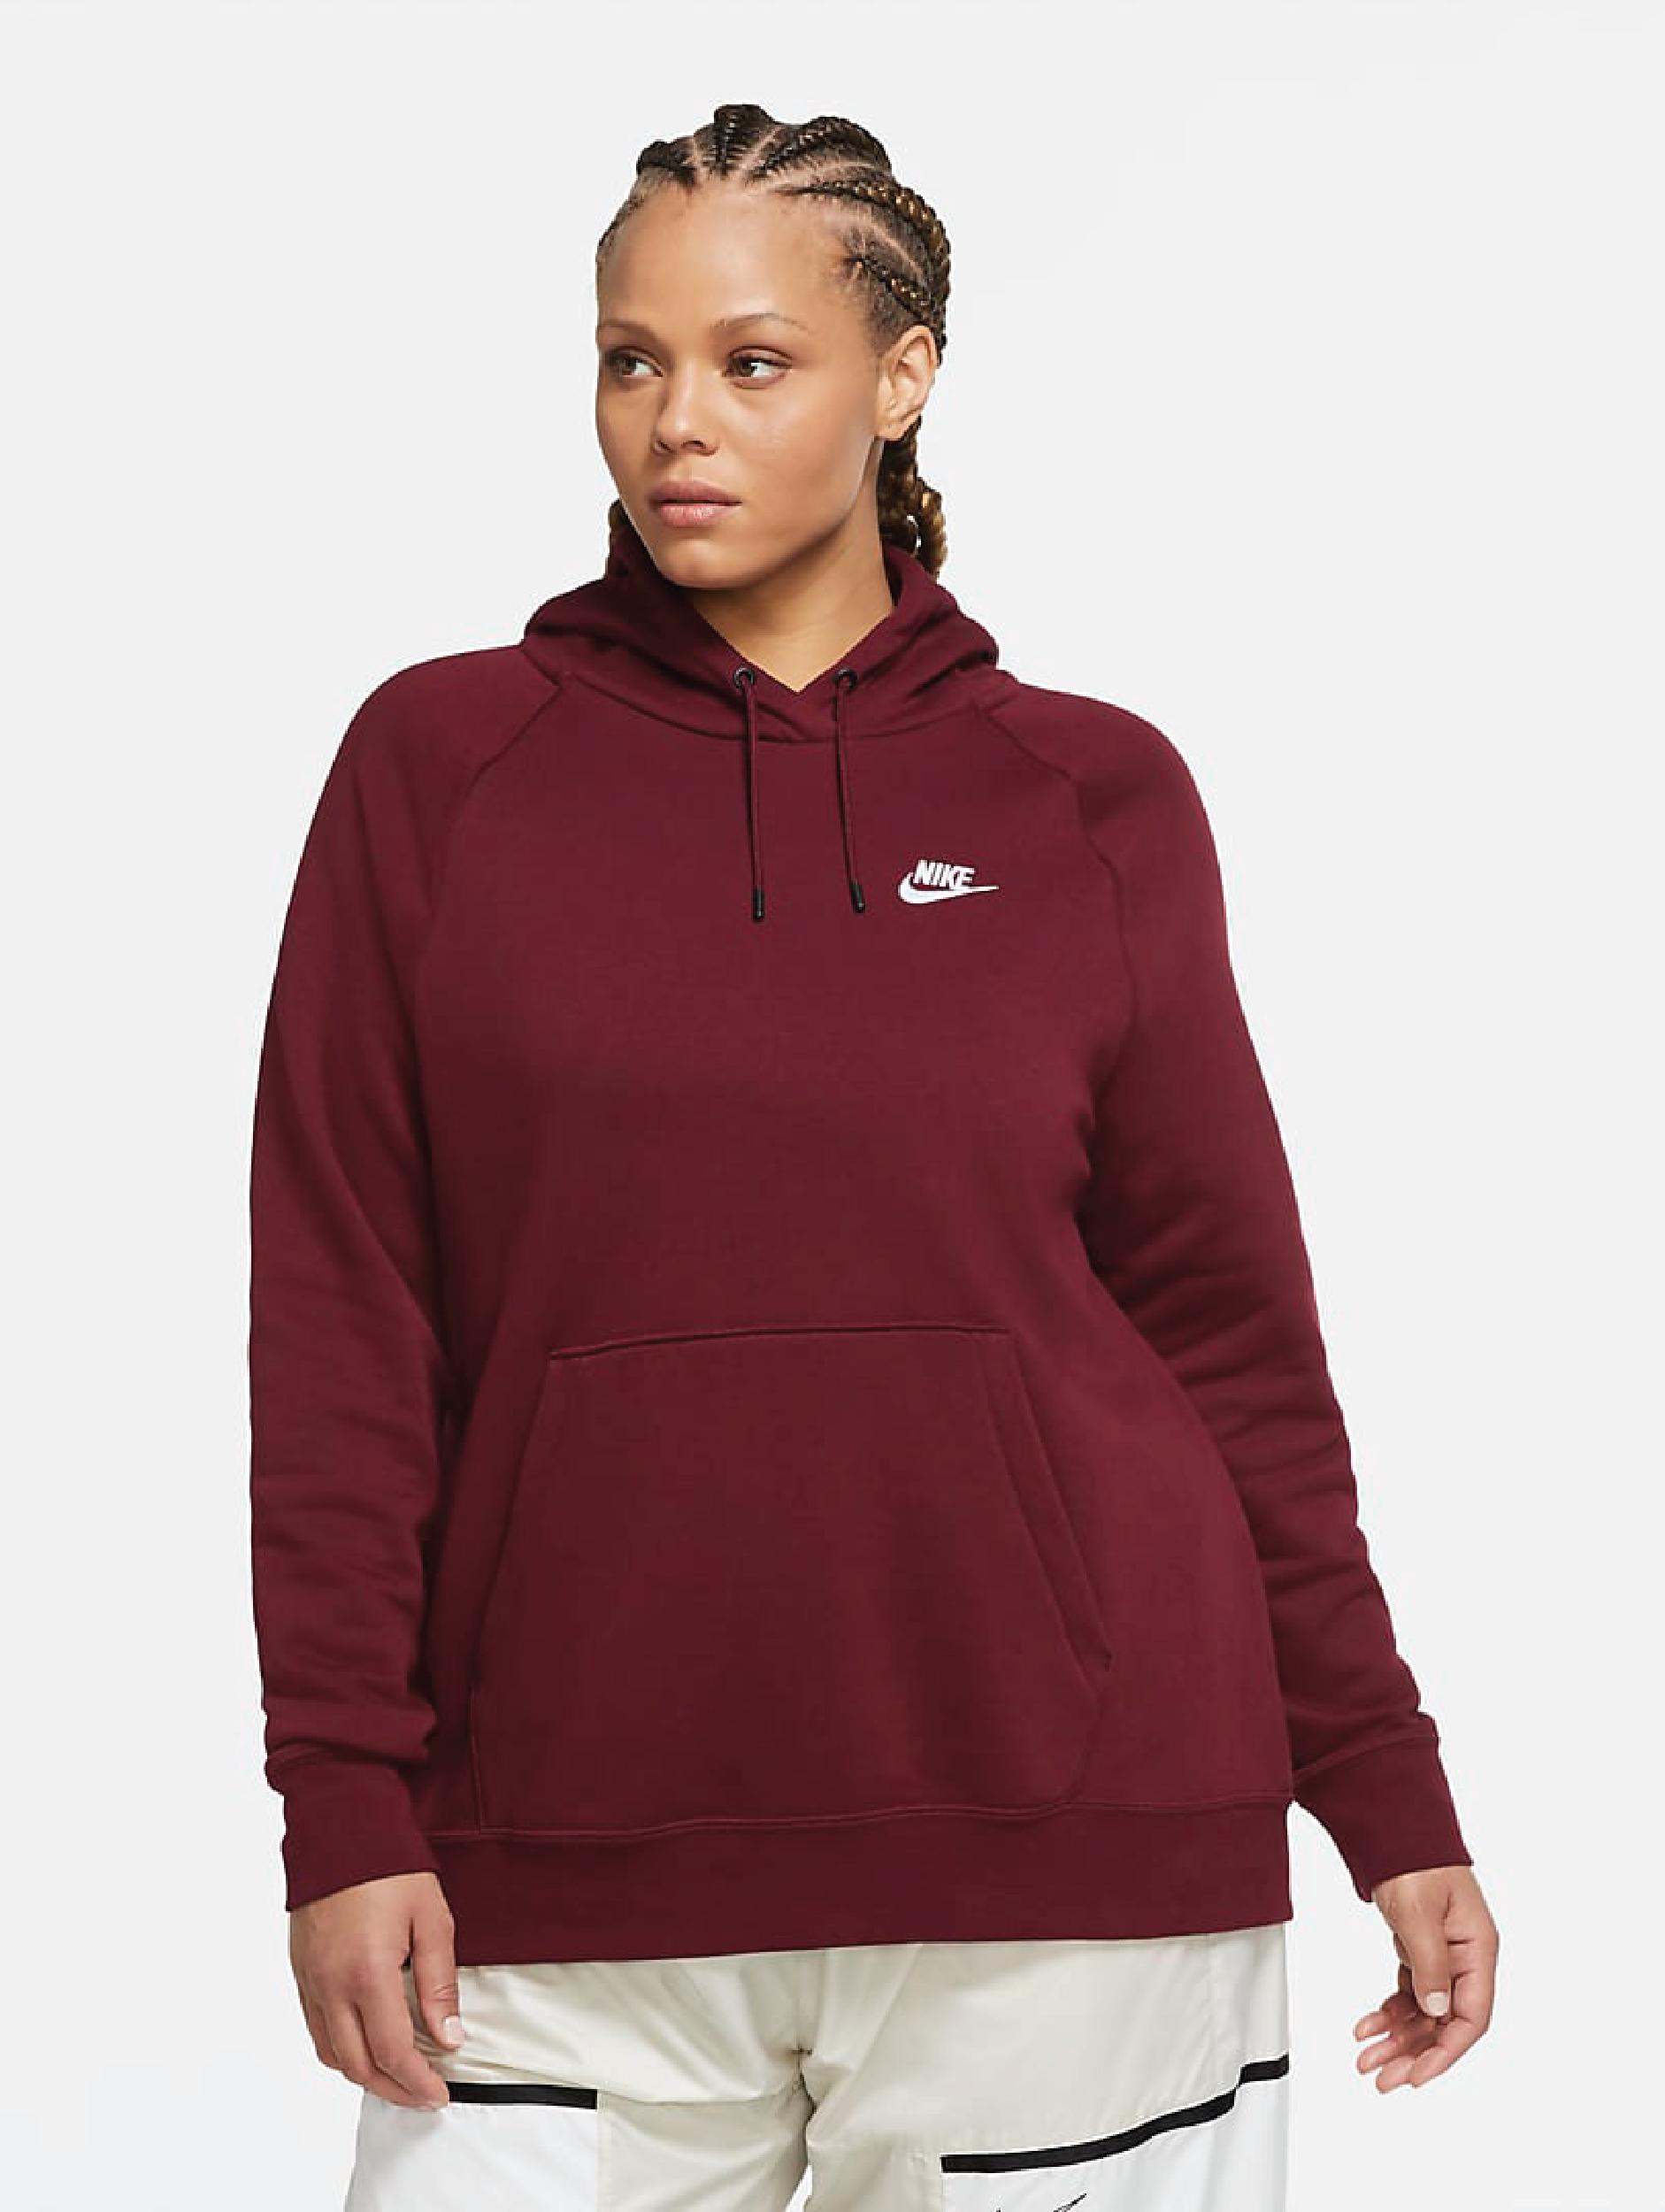 A model wearing the deep red hoodie